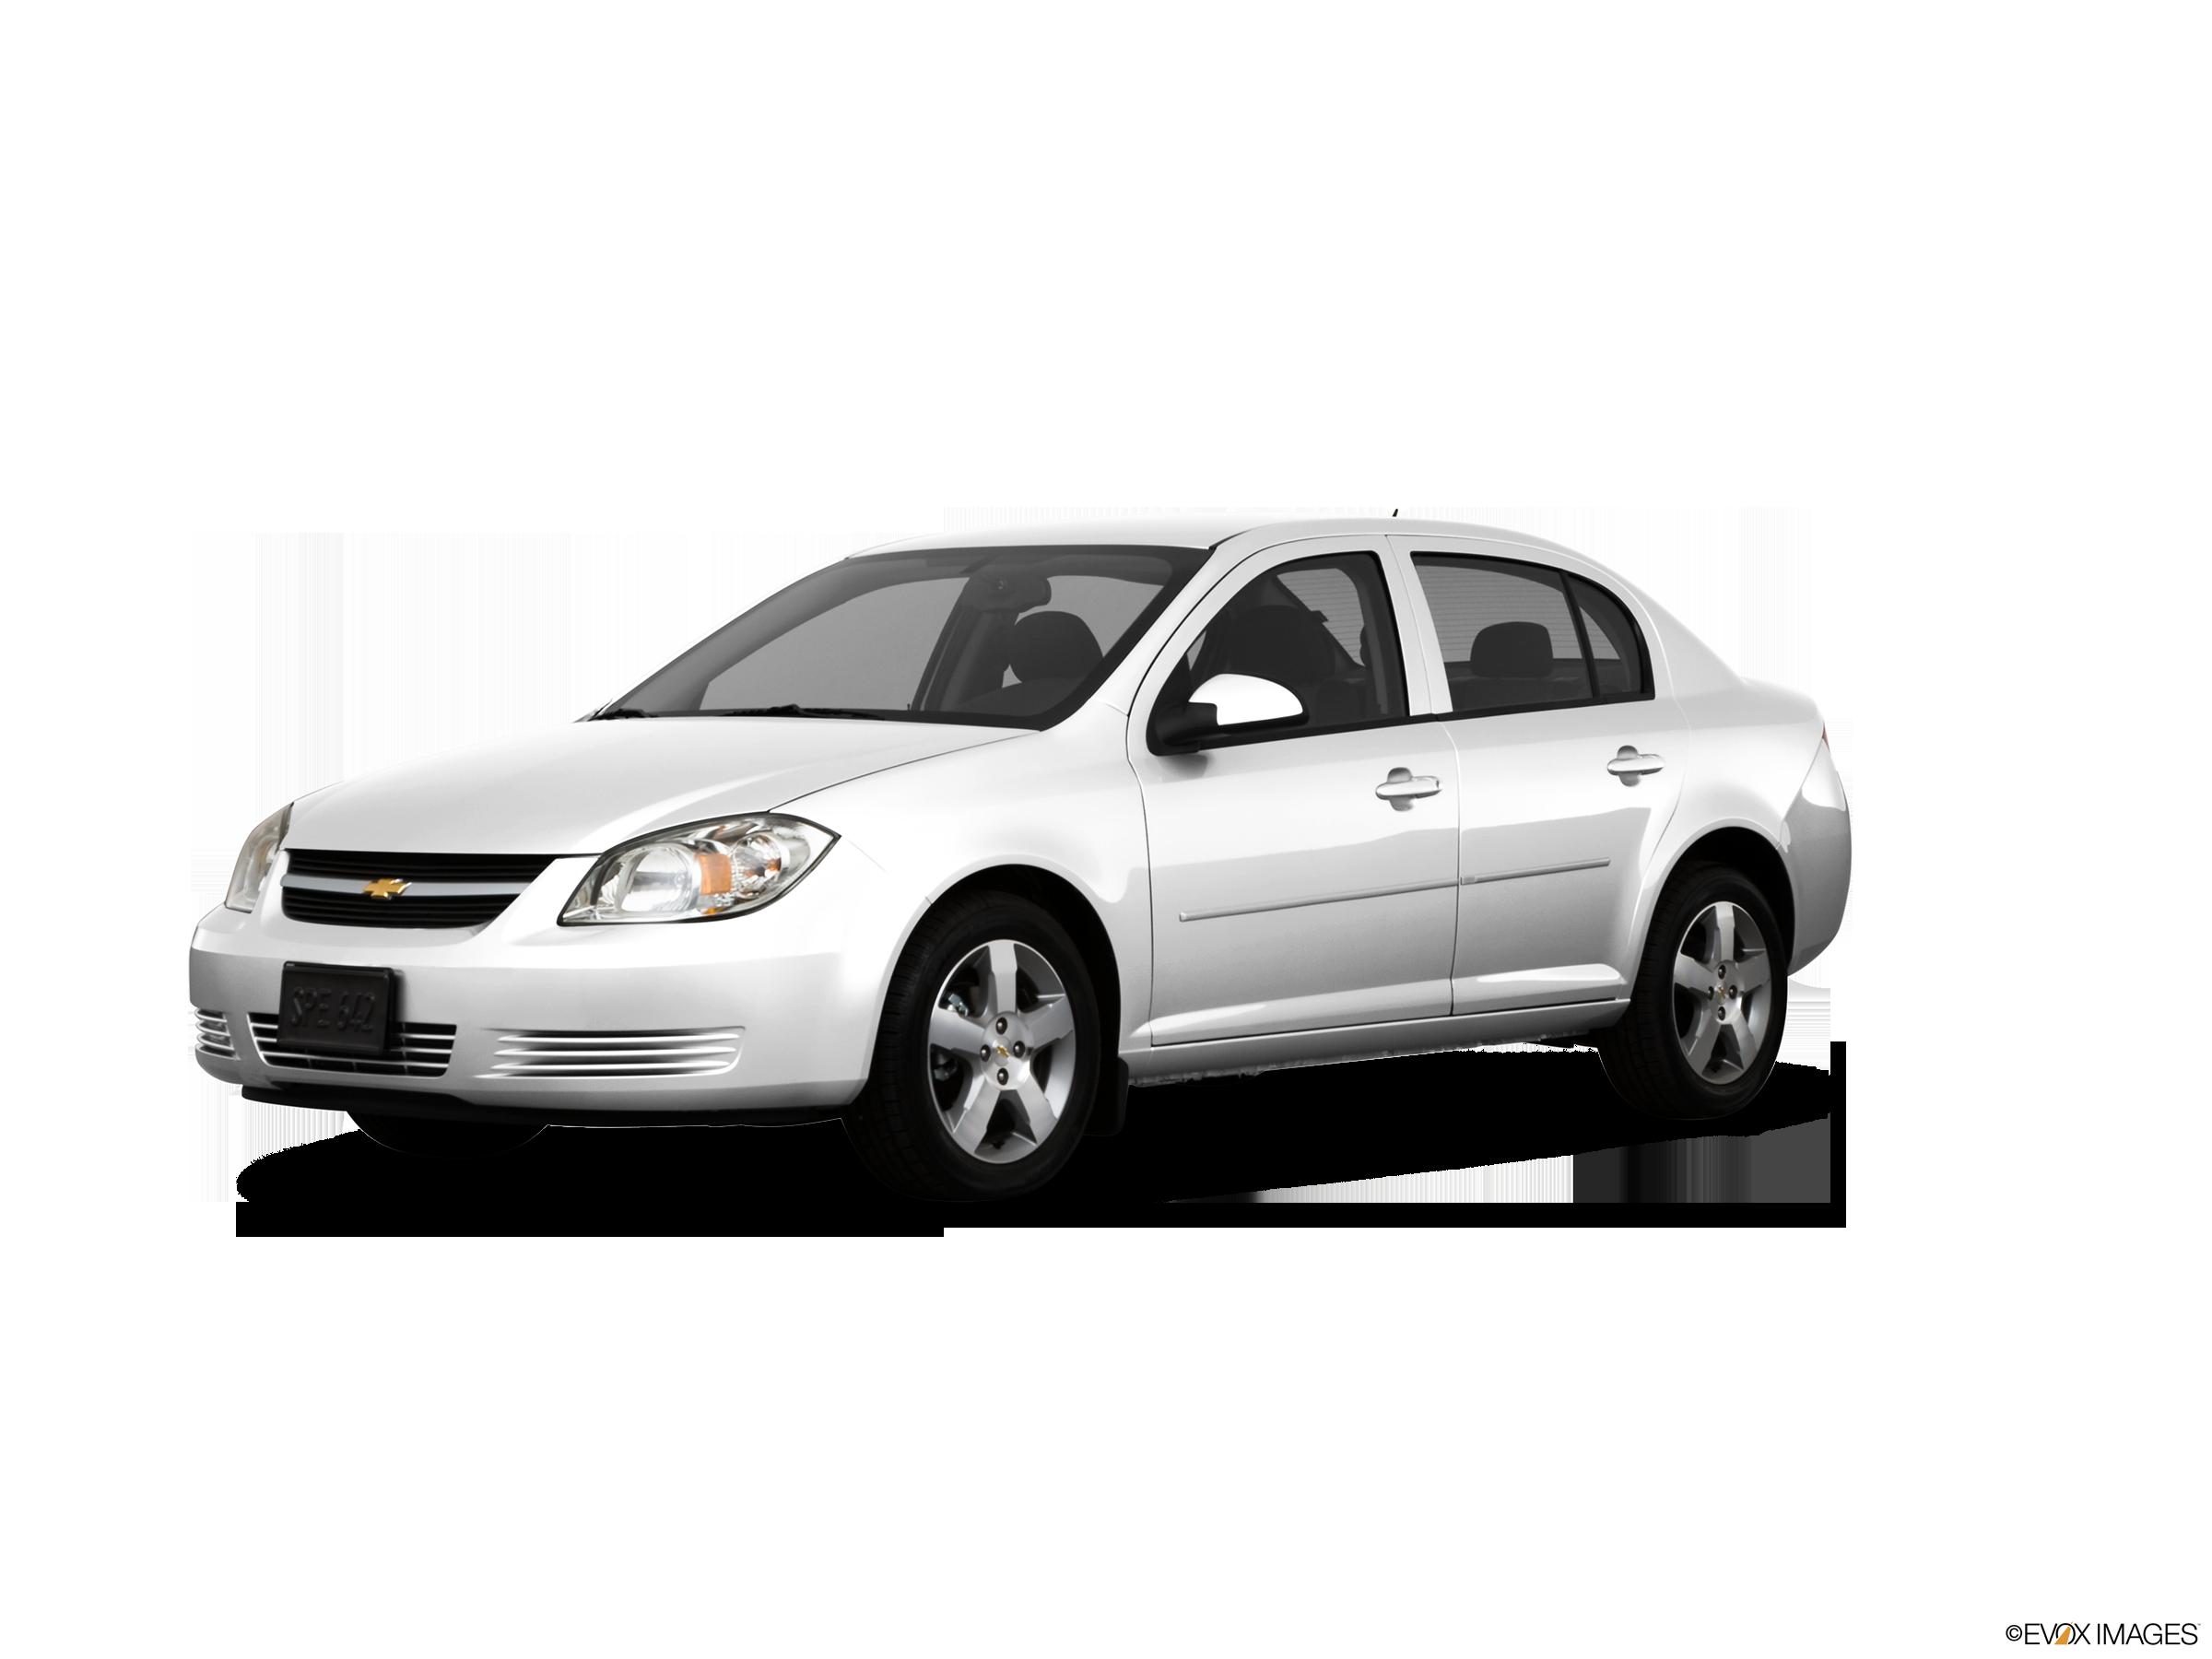 2010 Chevrolet Cobalt Values Cars For Sale Kelley Blue Book